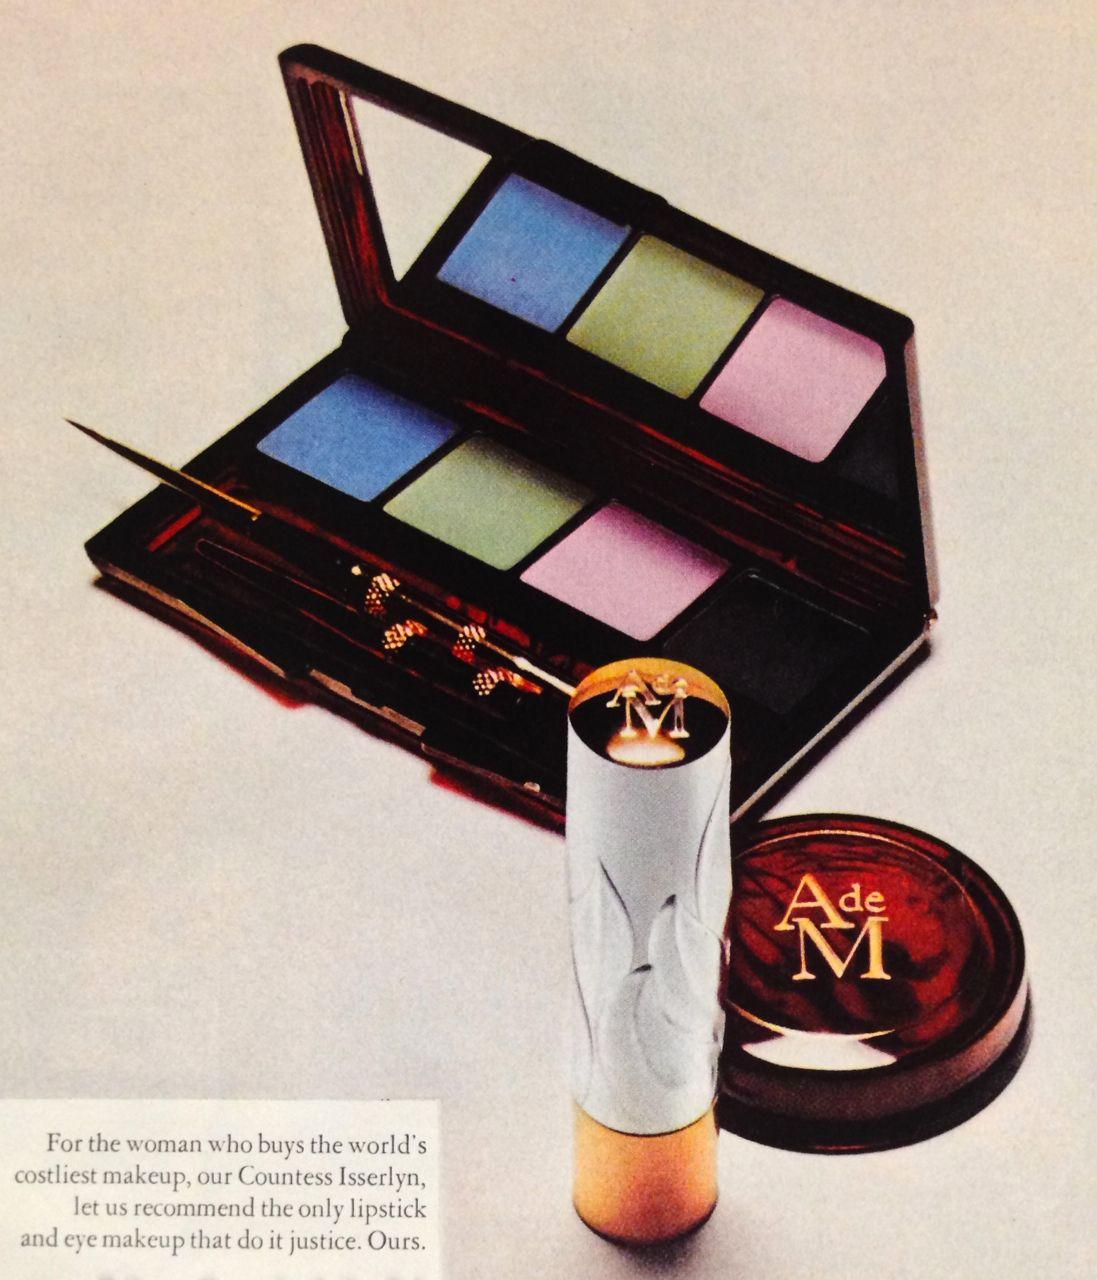 Alexandra De Markoff Countess Isserlyn Lipstick Shadowcake And